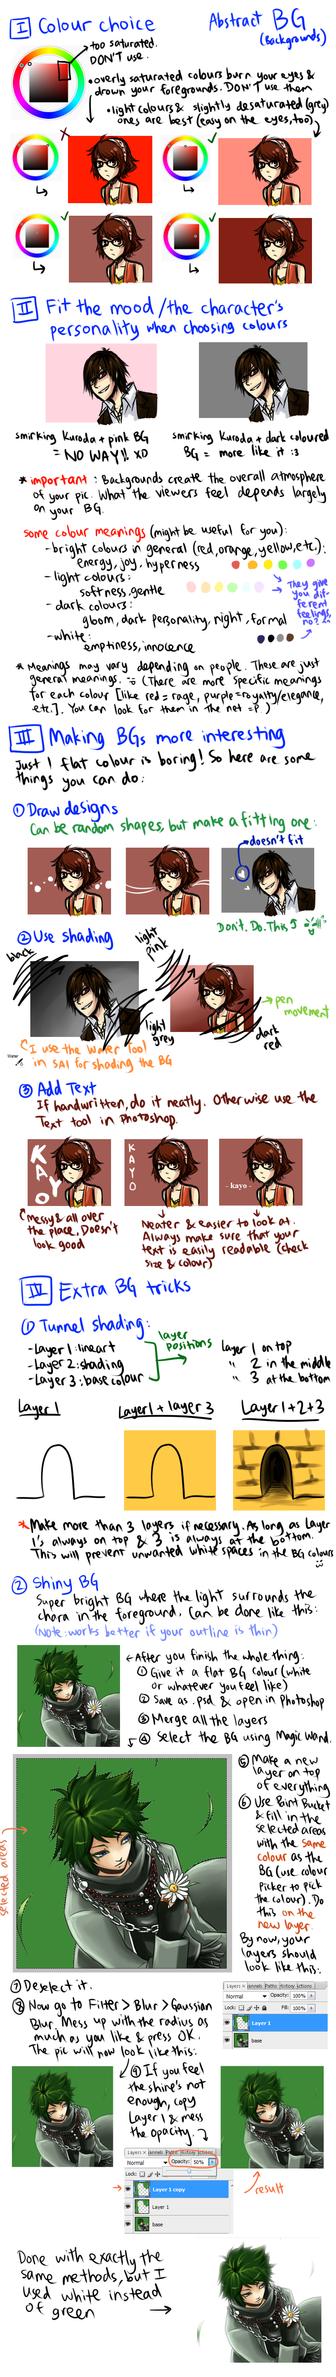 Abstract Background Tips by akai-shigo